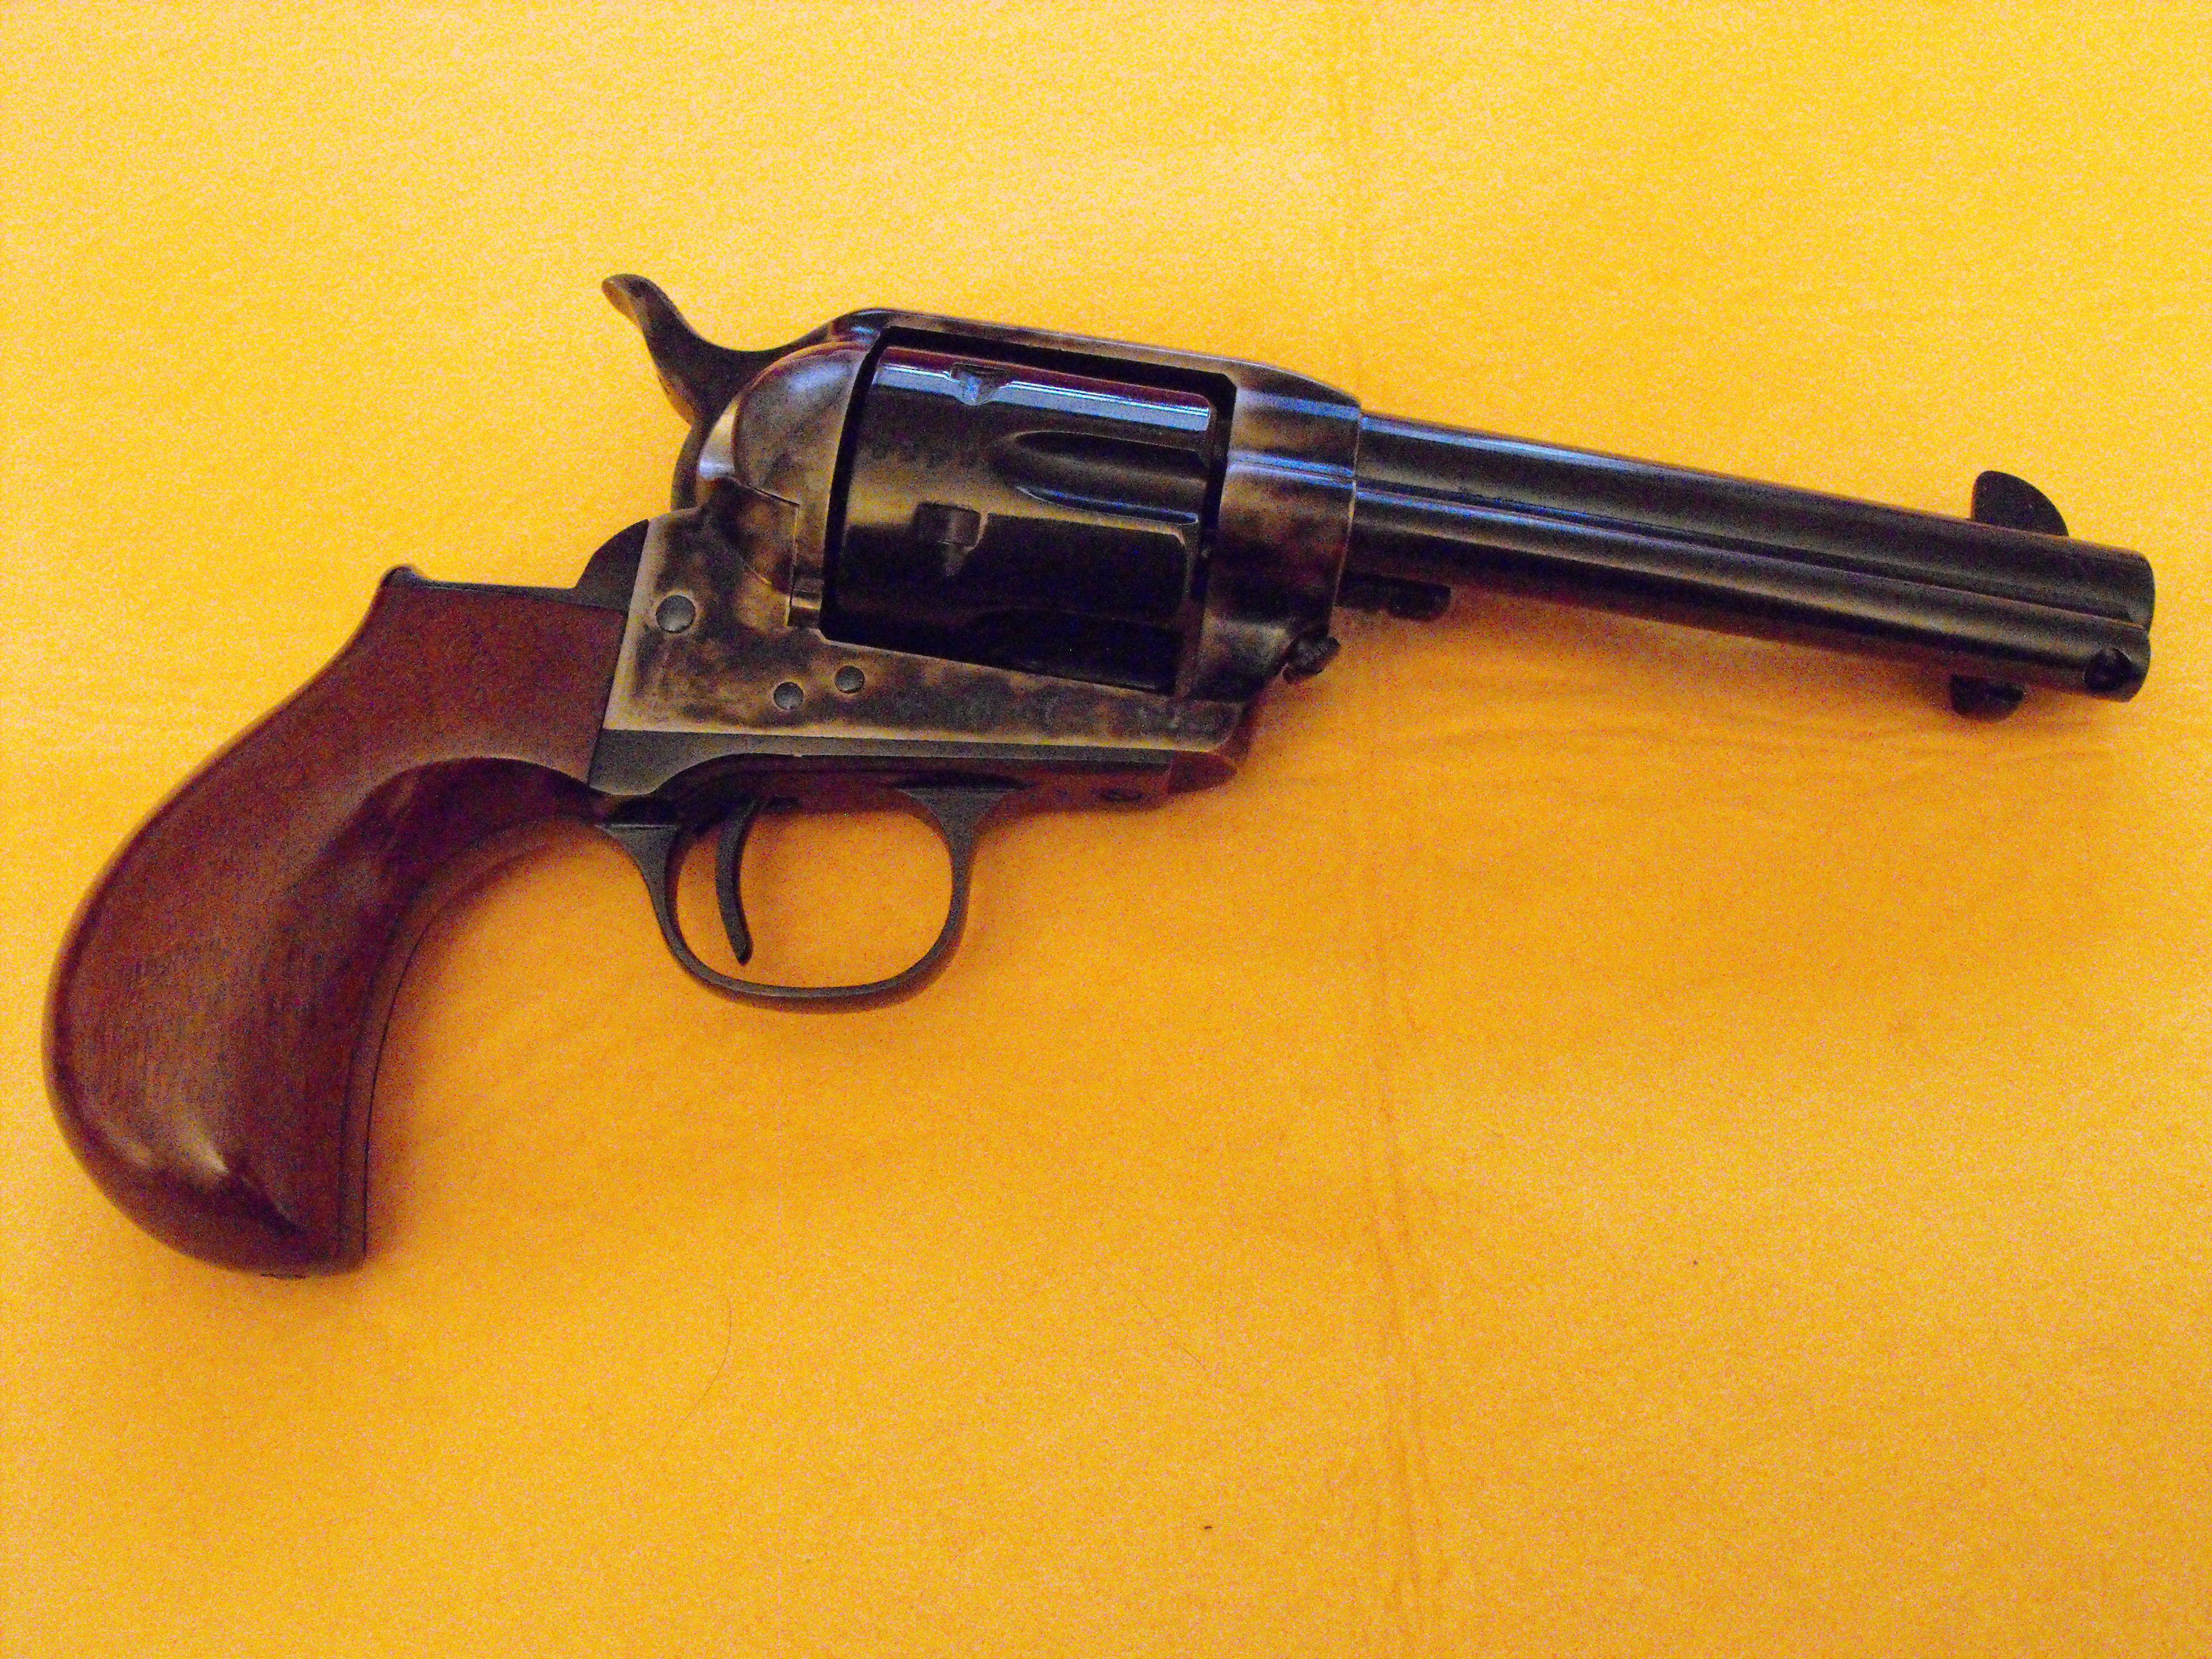 Pin by RAE Industries on cimarron arms | Hand guns, Guns, Revolver